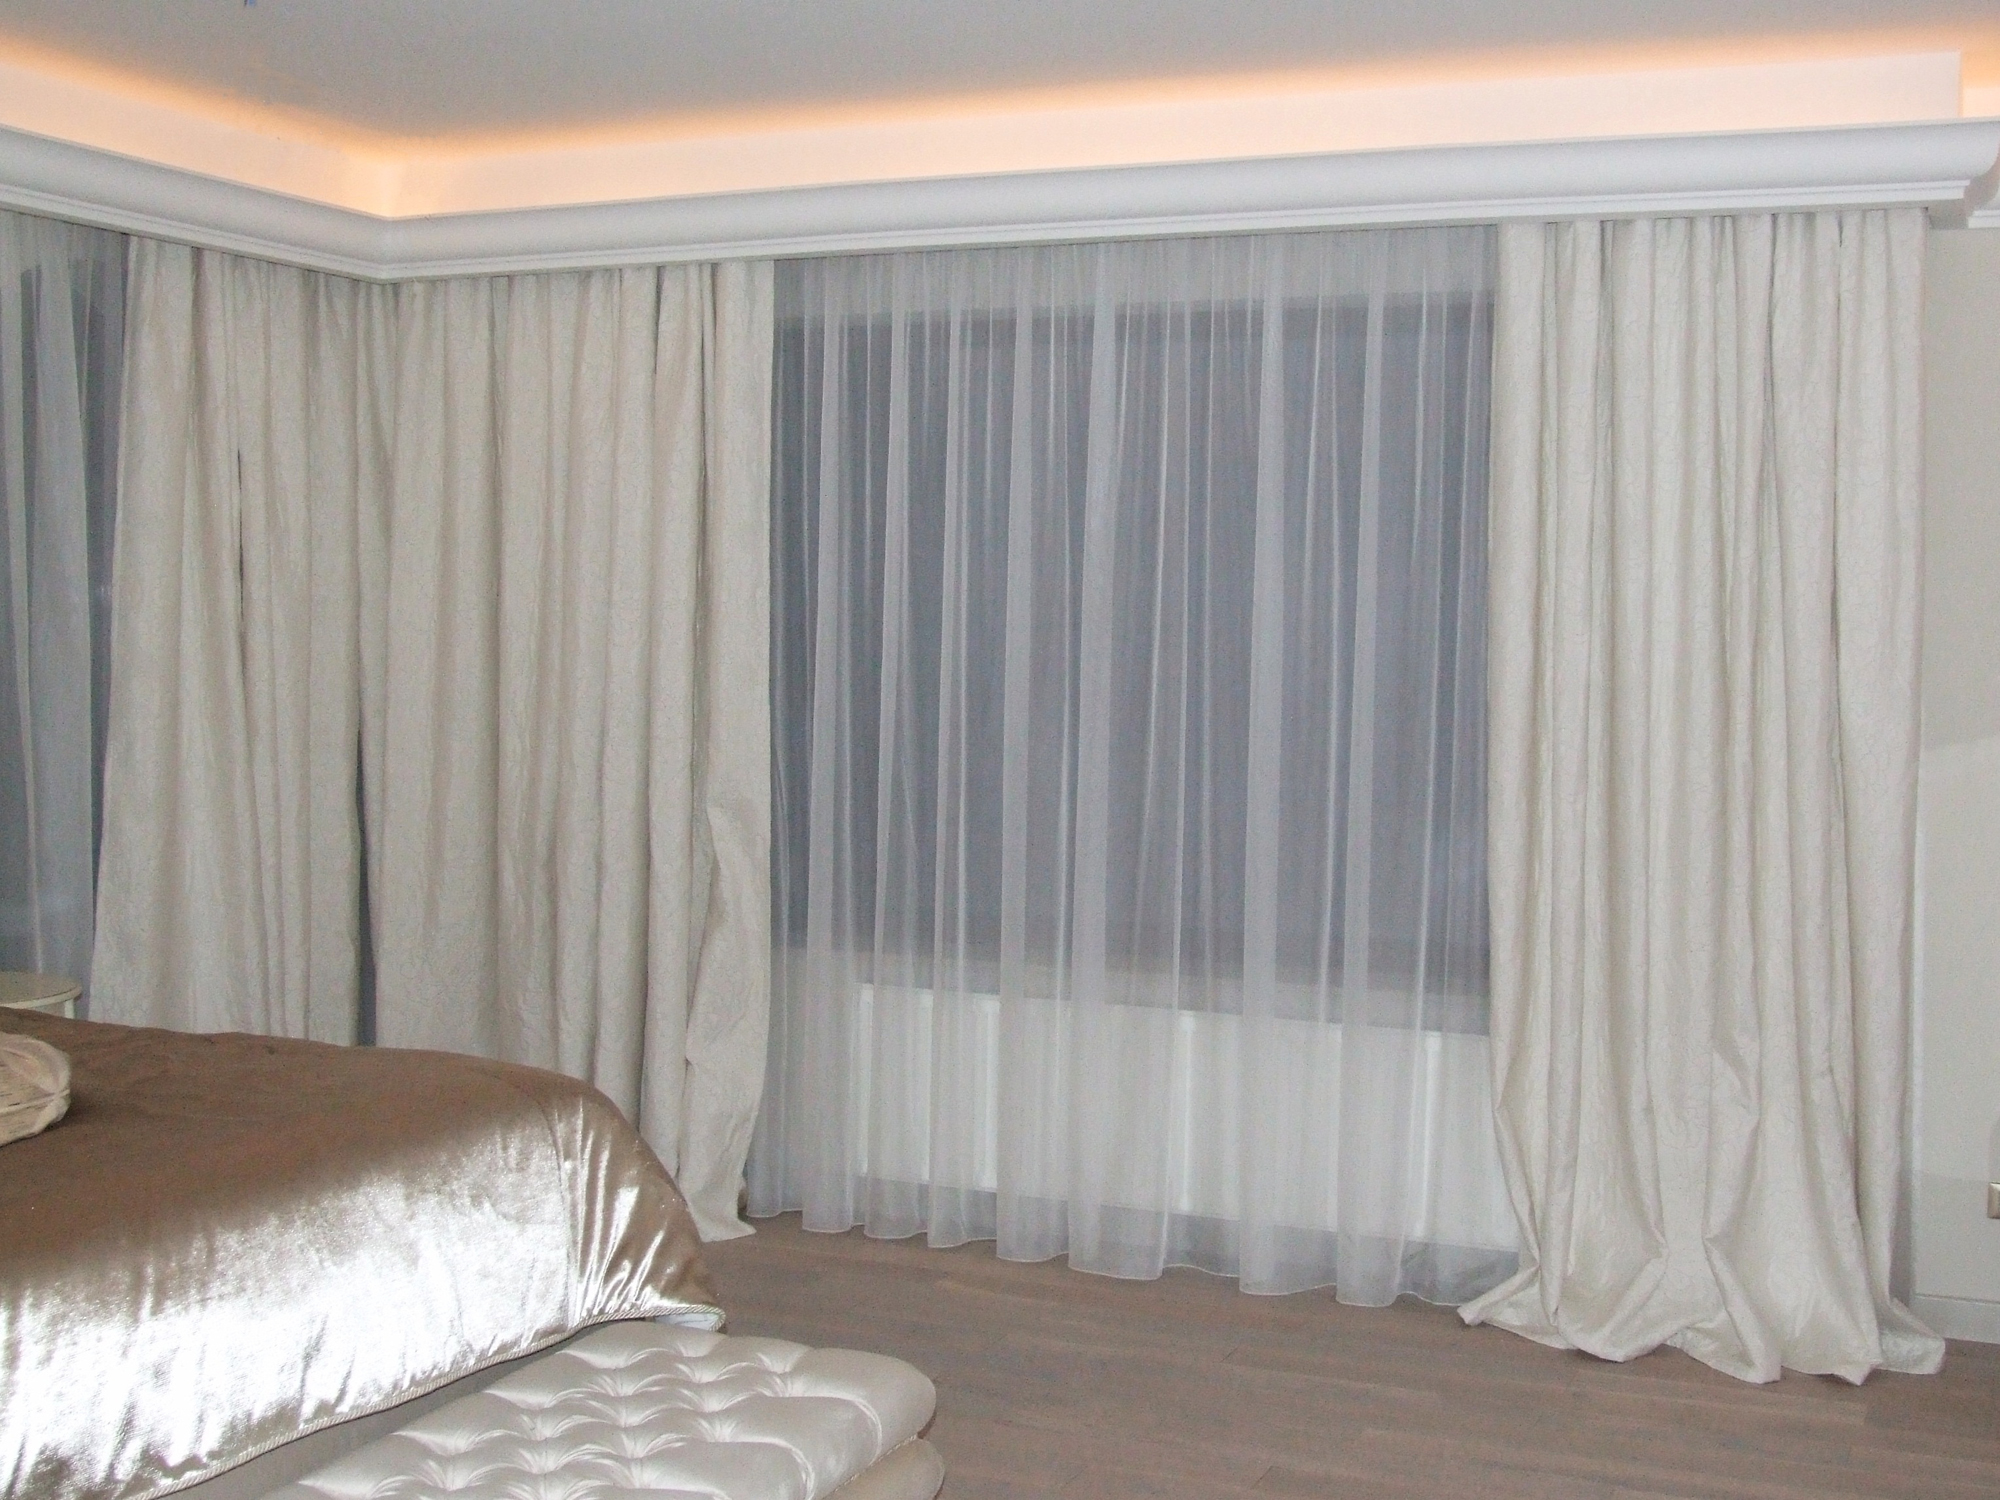 Perdele si draperii din materiale textile VRIESCO - Poza 2